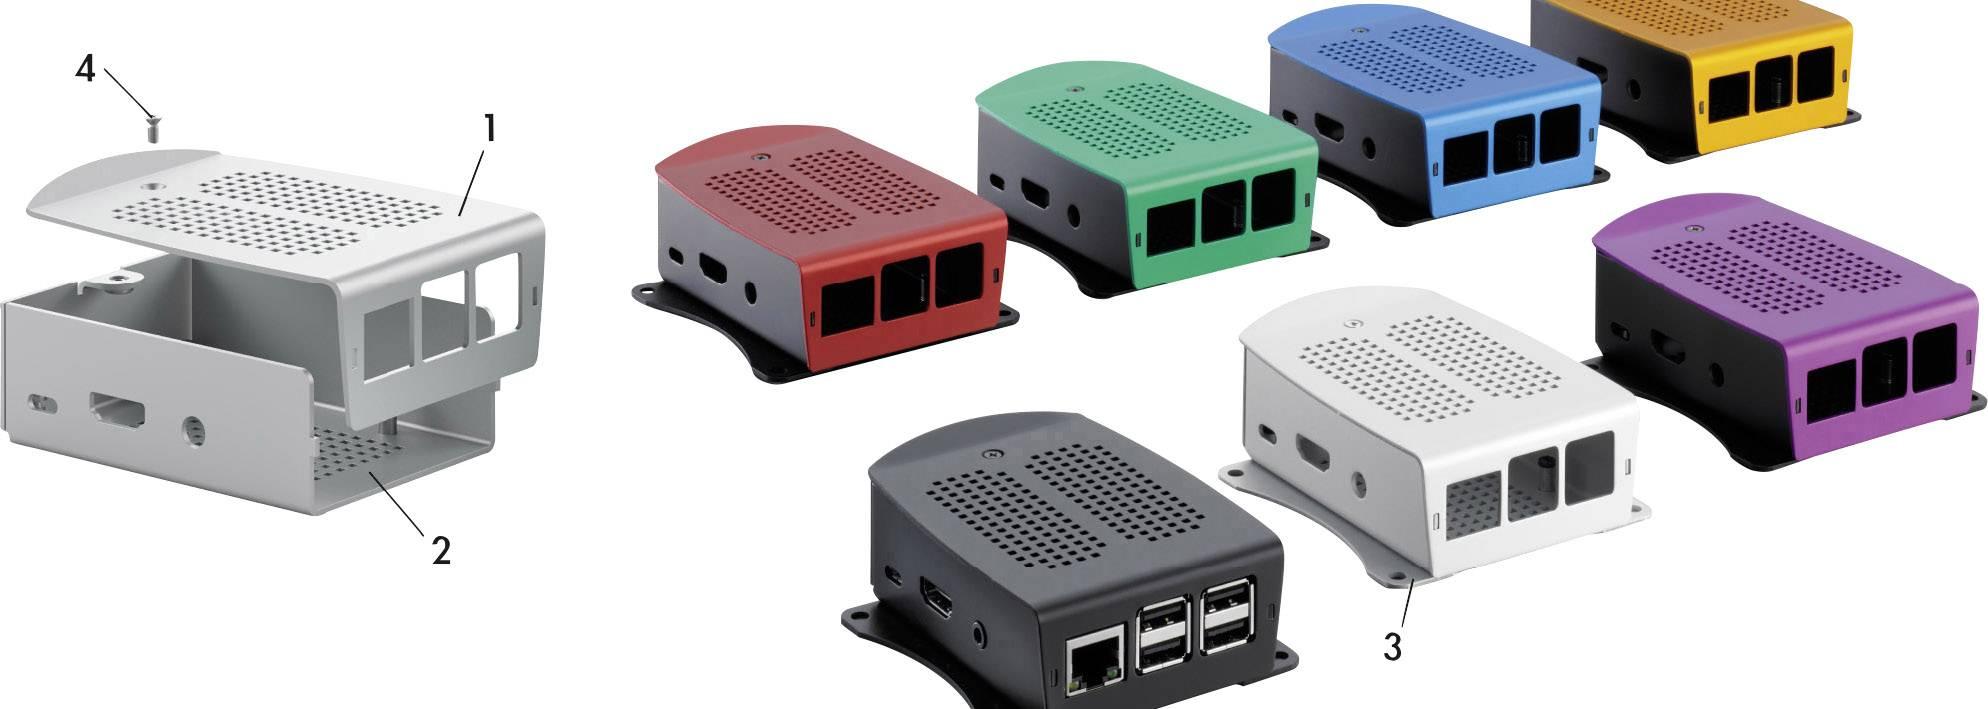 Kryt pro Raspberry Pi® Fischer Elektronik 10135288, modrá, černá